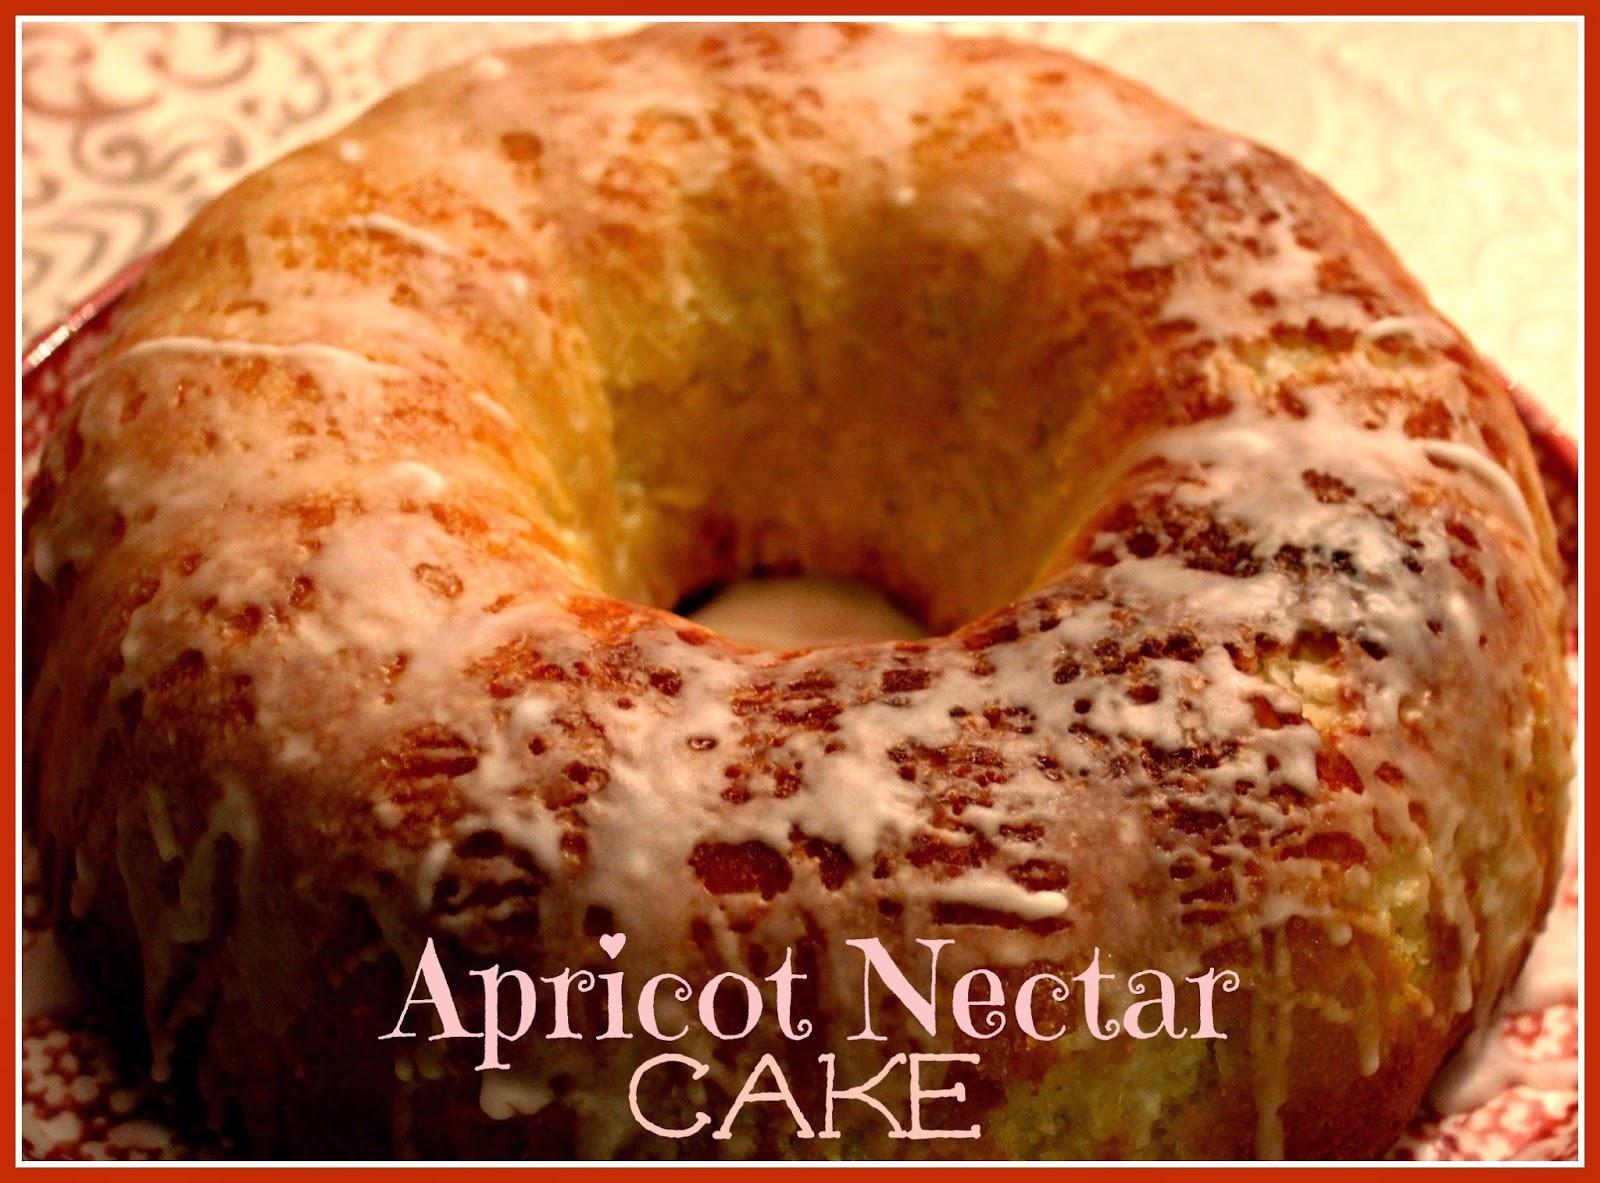 Lemon Pound Cake Recipe With Apricot Nectar